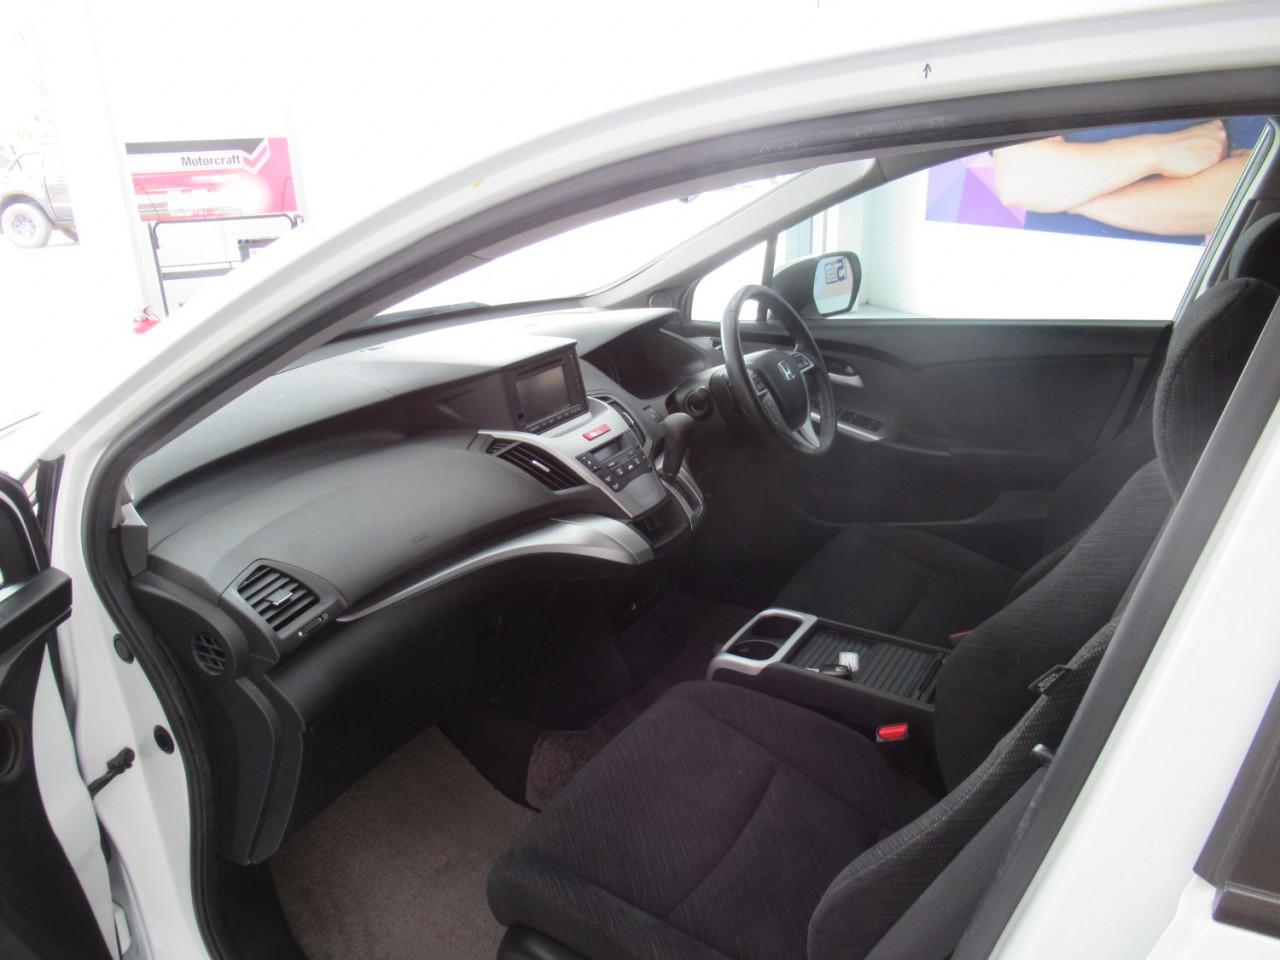 2013 Honda Odyssey 4TH GEN MY13 Wagon Image 31